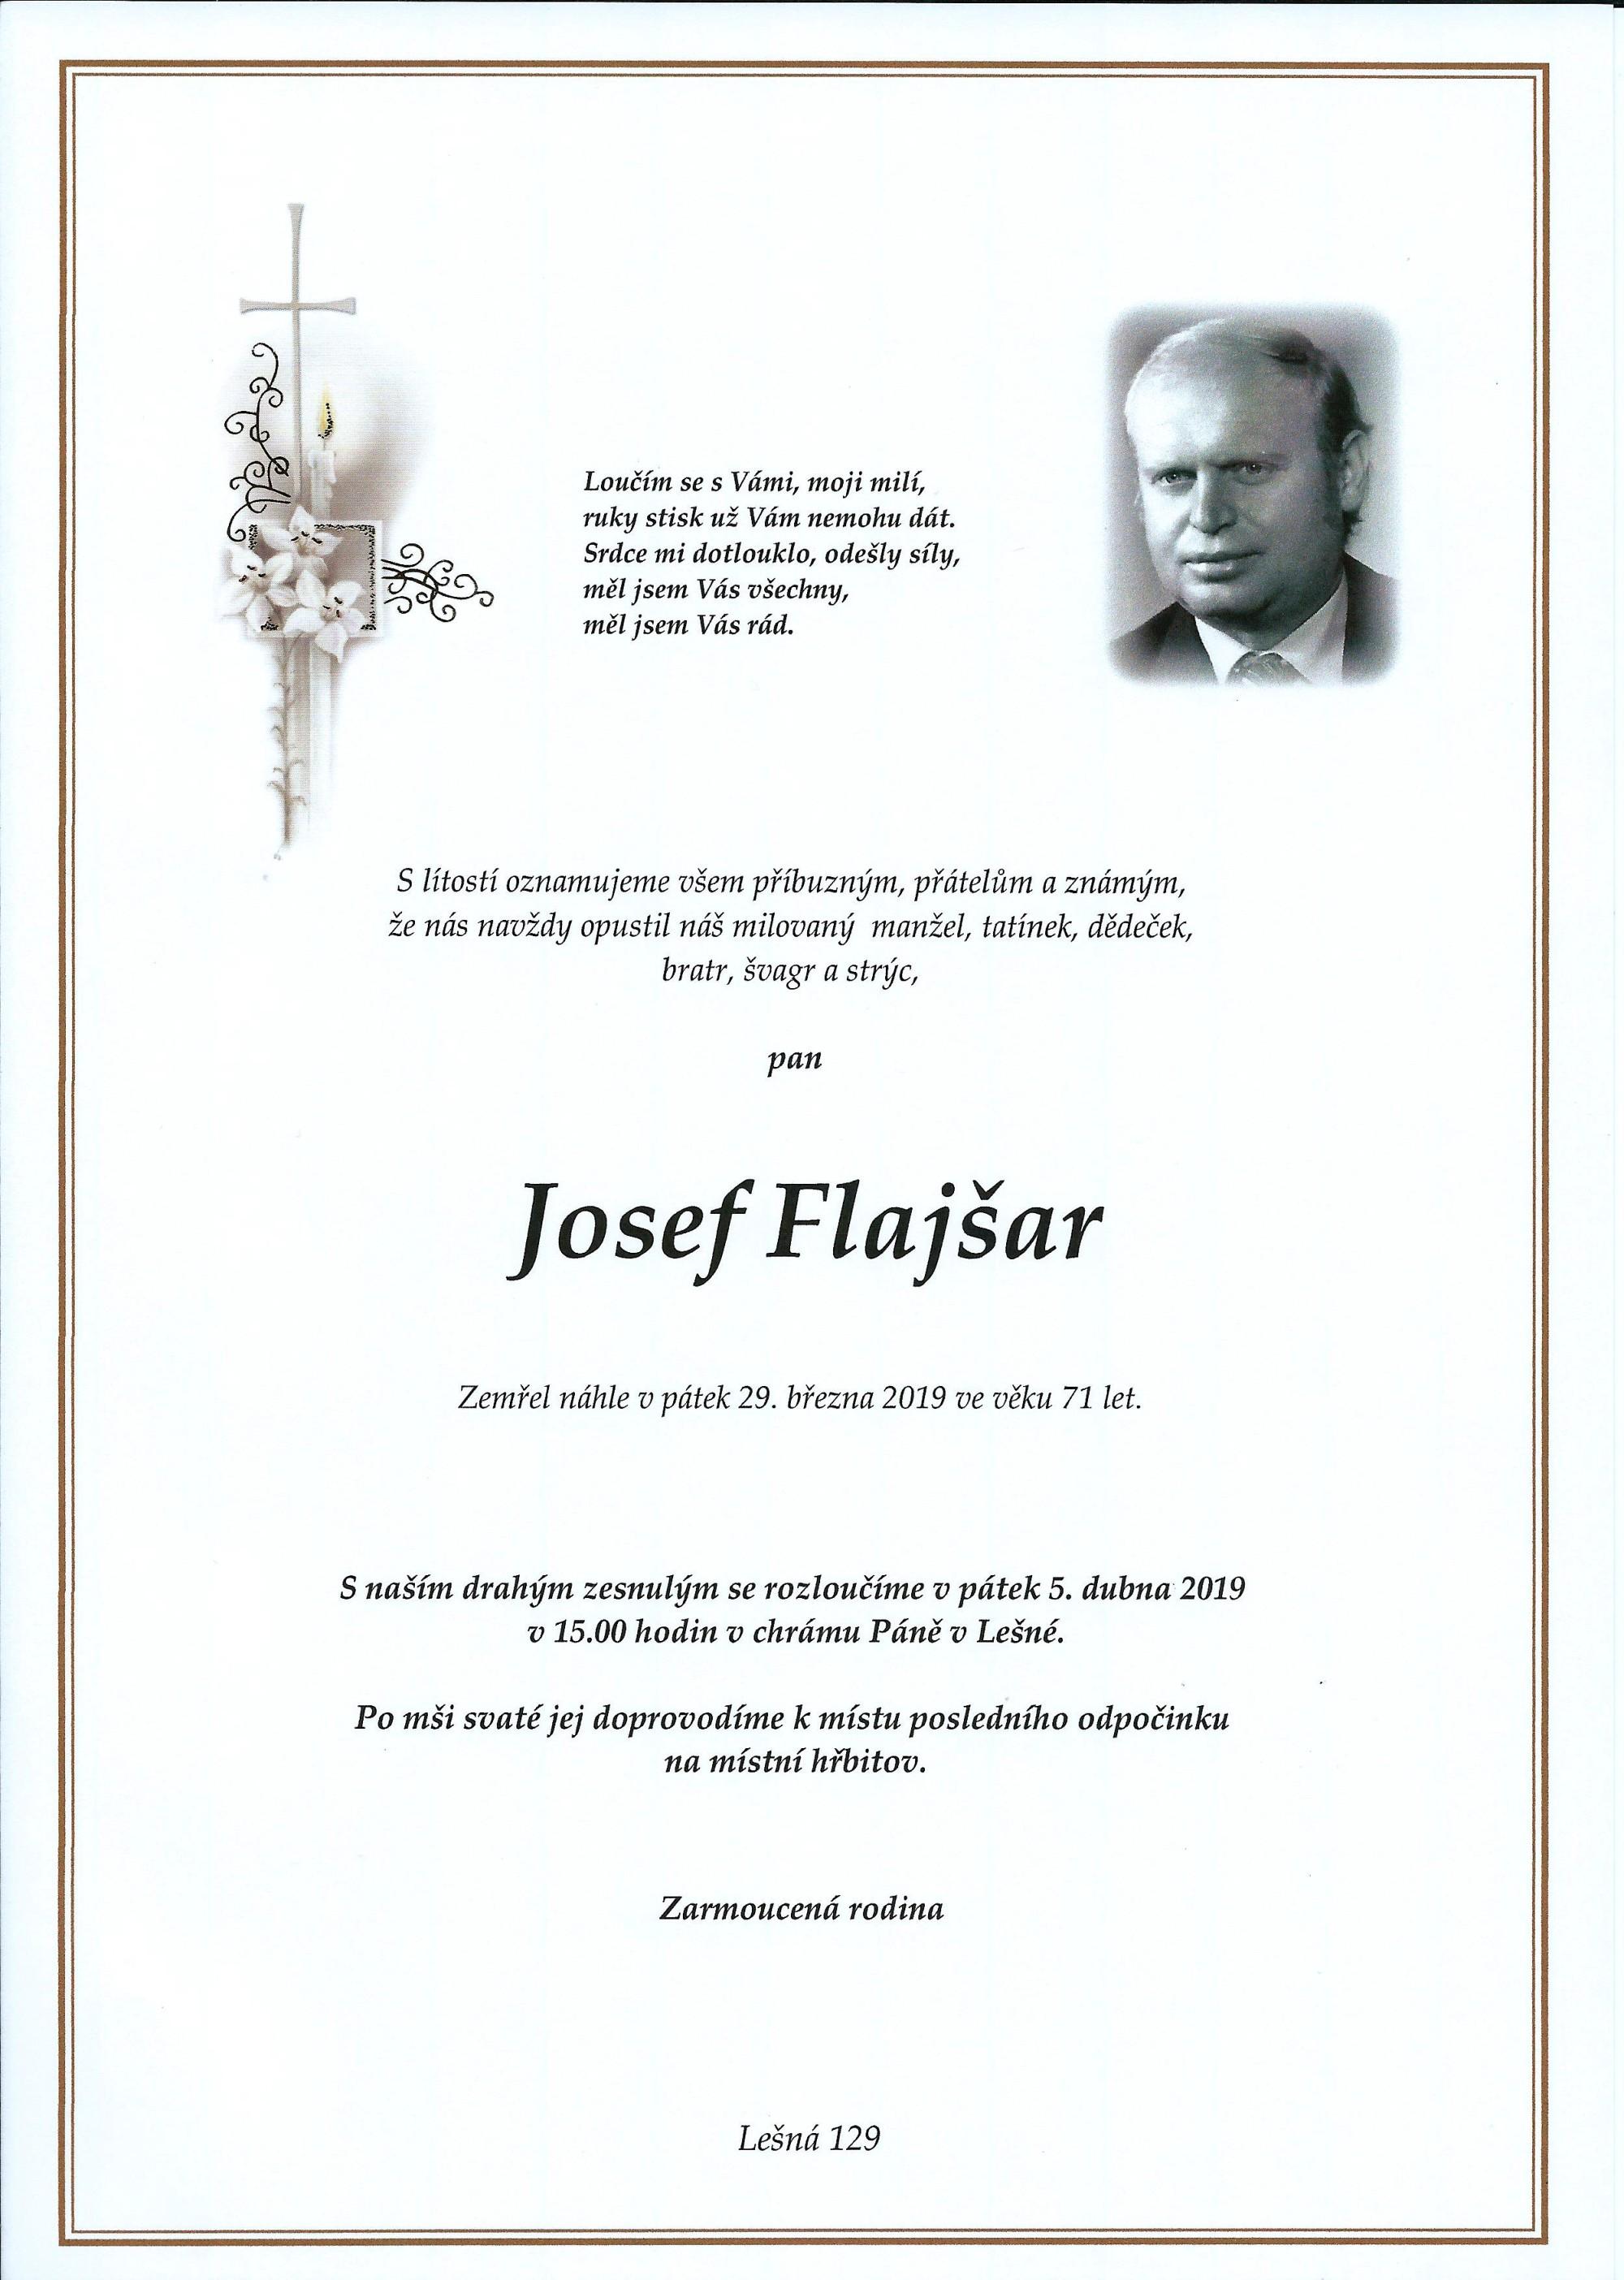 Josef Flajšar